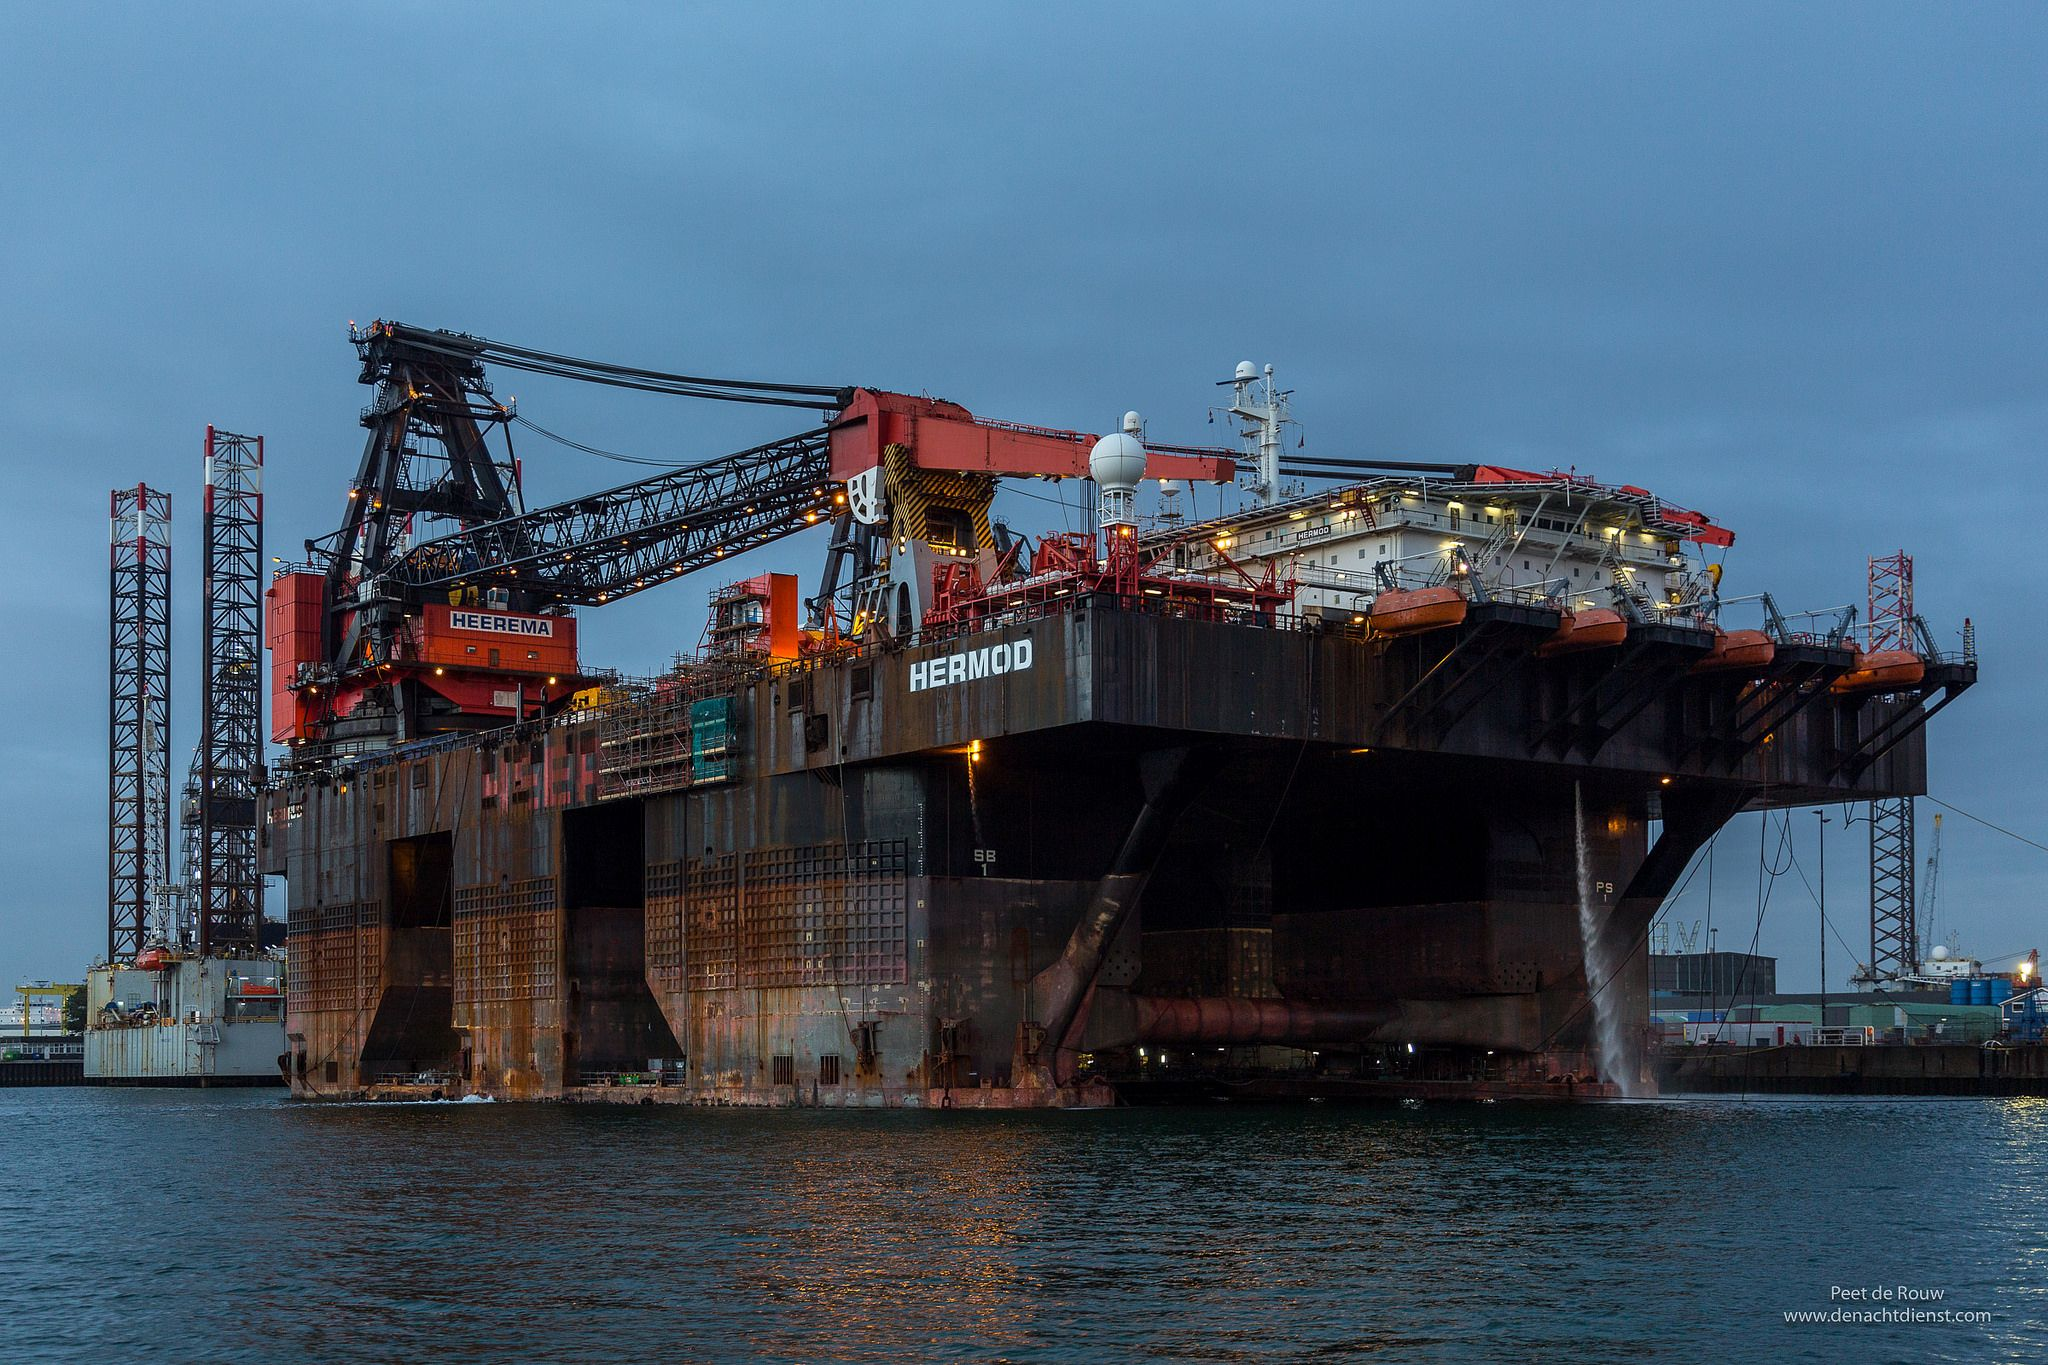 https://flic.kr/p/Mxe8qG   SSCV Hermod   Semi Submersible Crane Vessel Hermod at the Keppel Verolme shipyard in the Port of Rotterdam.   For details about the Hermod: hmc.heerema.com/fleet/hermod/